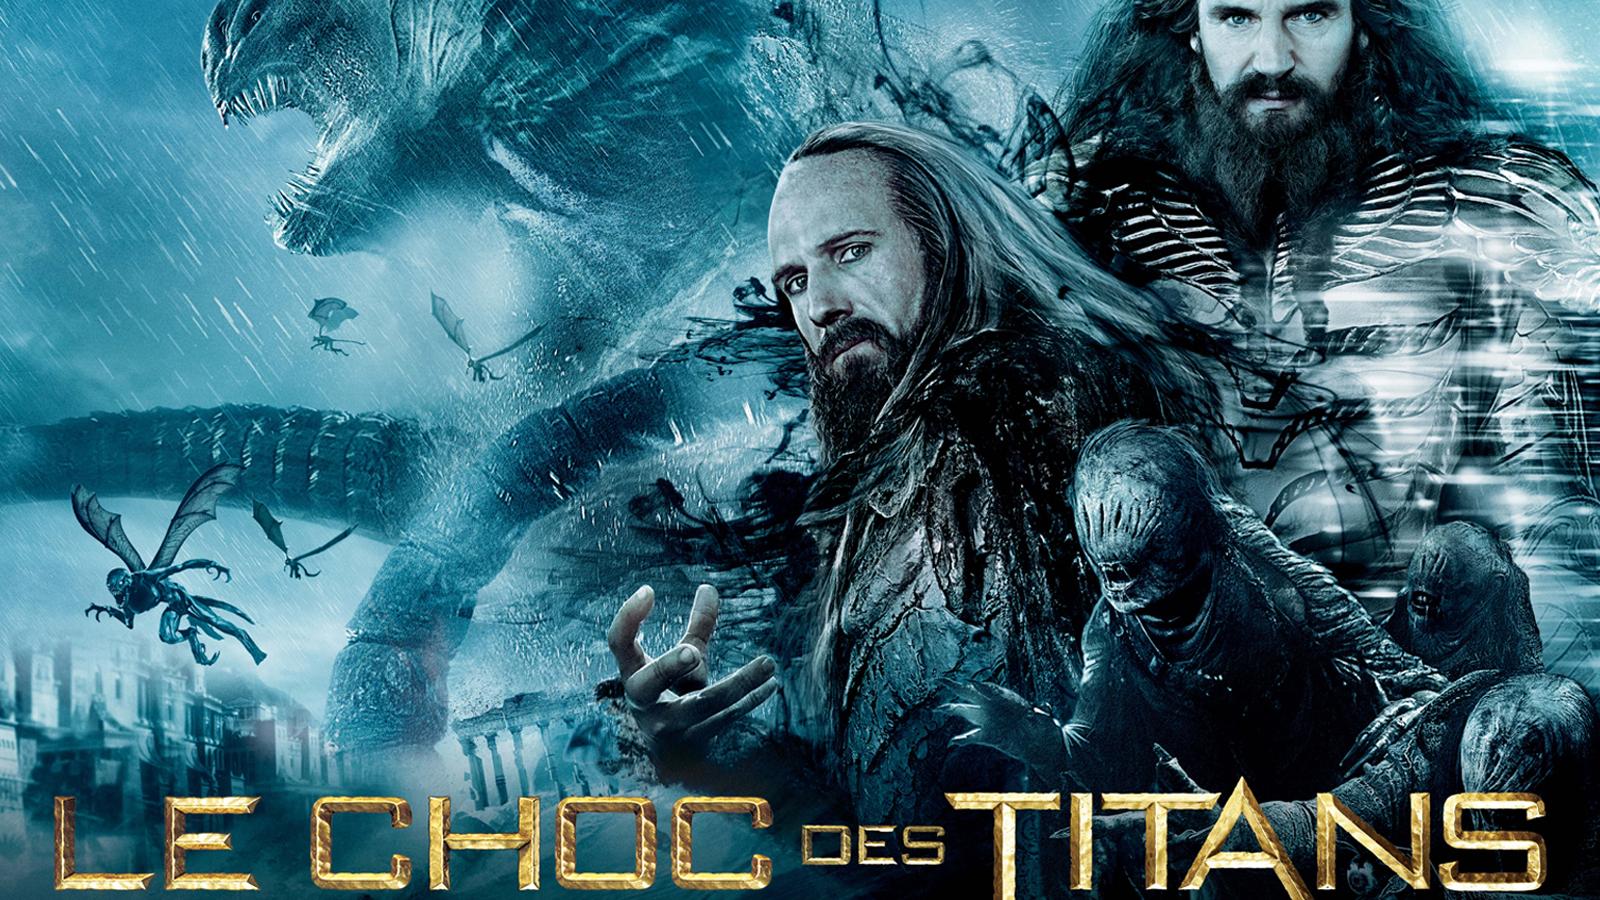 Free Download Hades Clash Of The Titans Wallpaper 9 Wallpaper